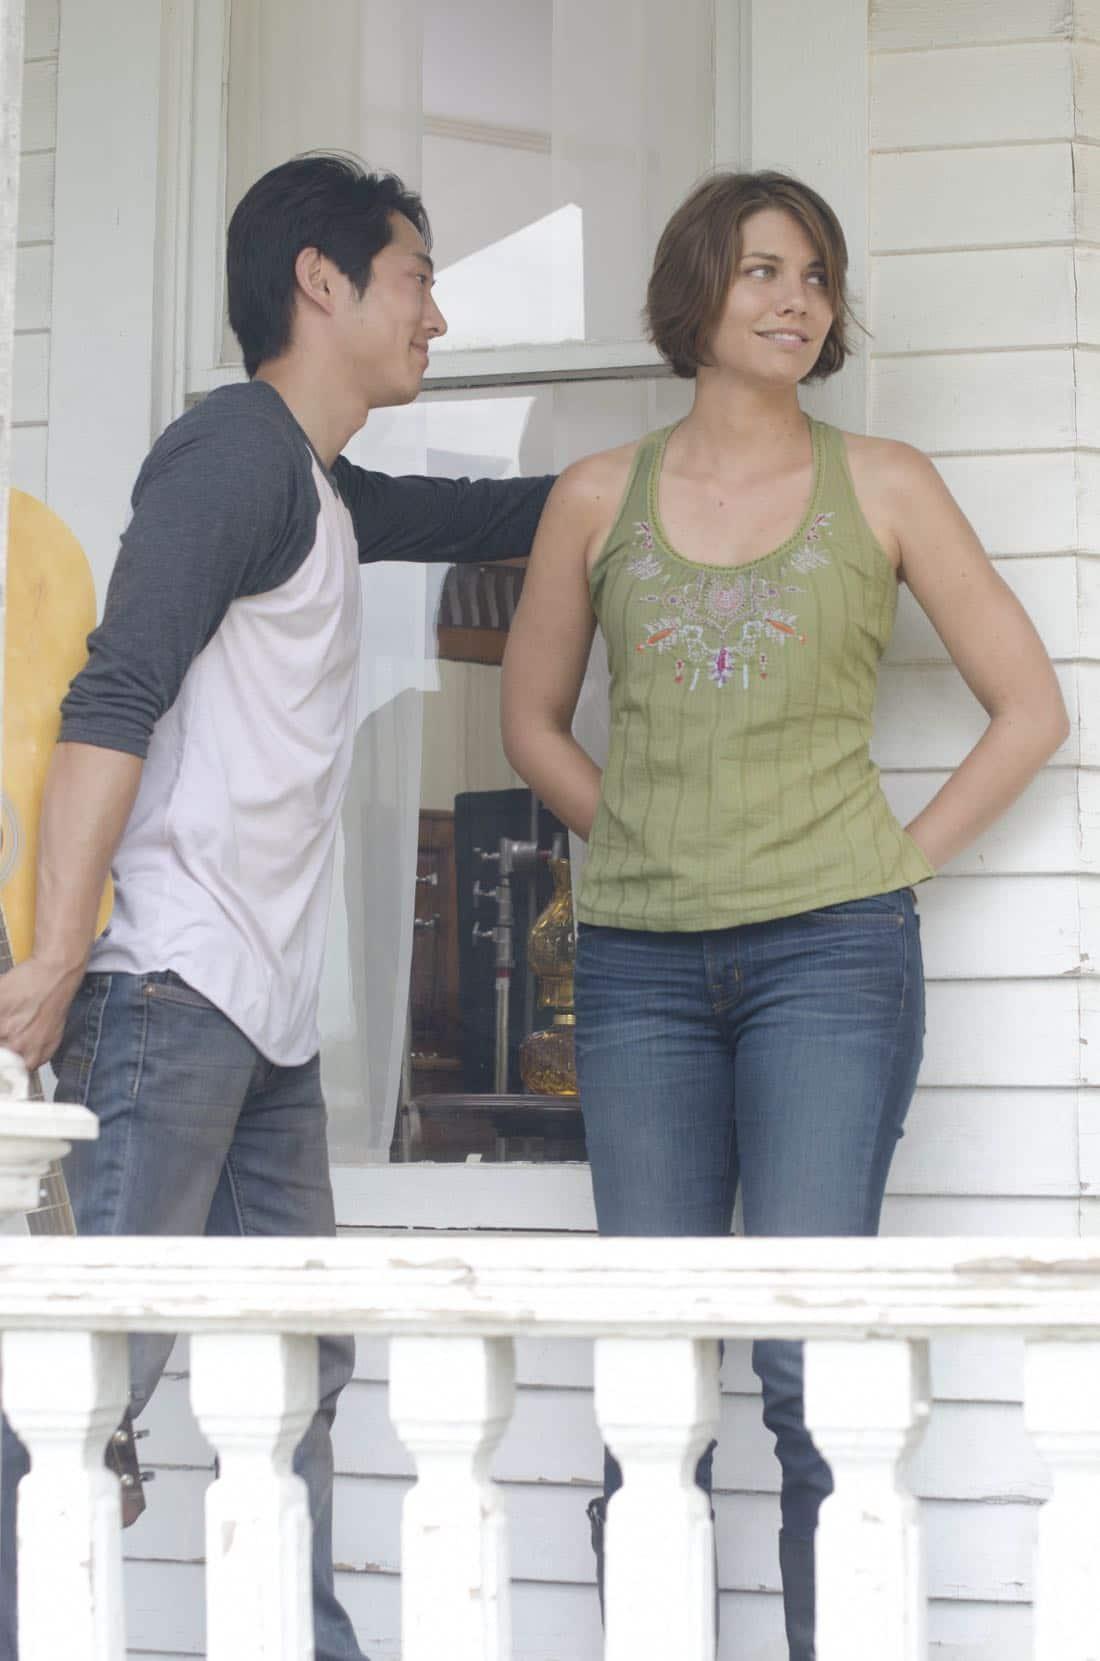 Glenn (Steven Yeun) and Maggie Greene (Lauren Cohan) - The Walking Dead - Season 2, Episode 5